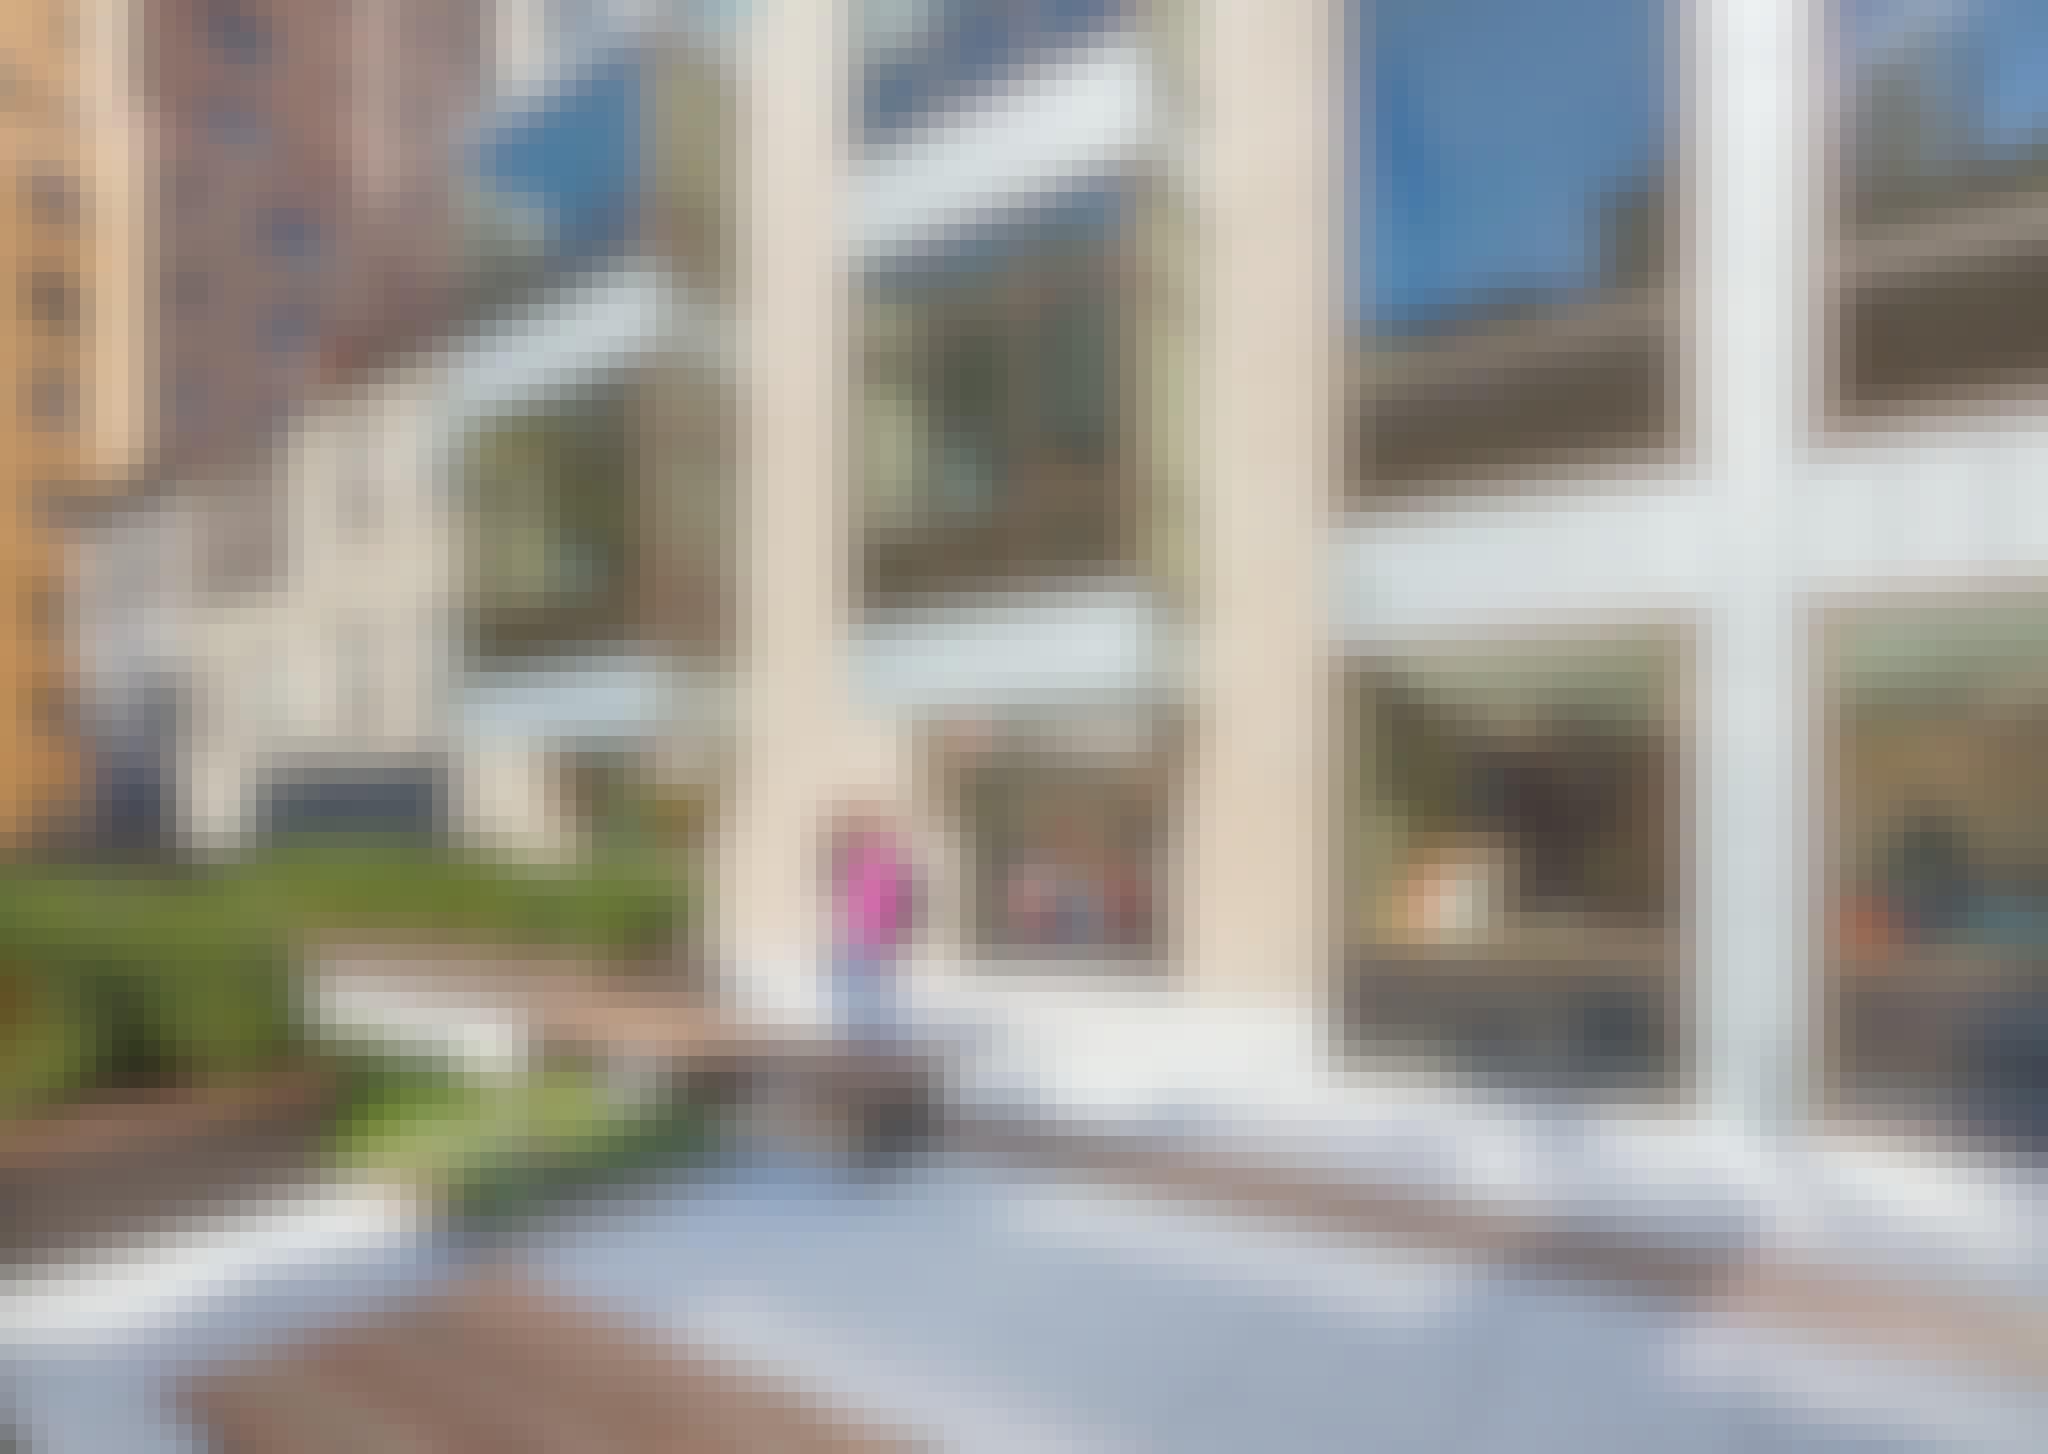 indoor outdoor space in modern school design for health and wellbeing of students